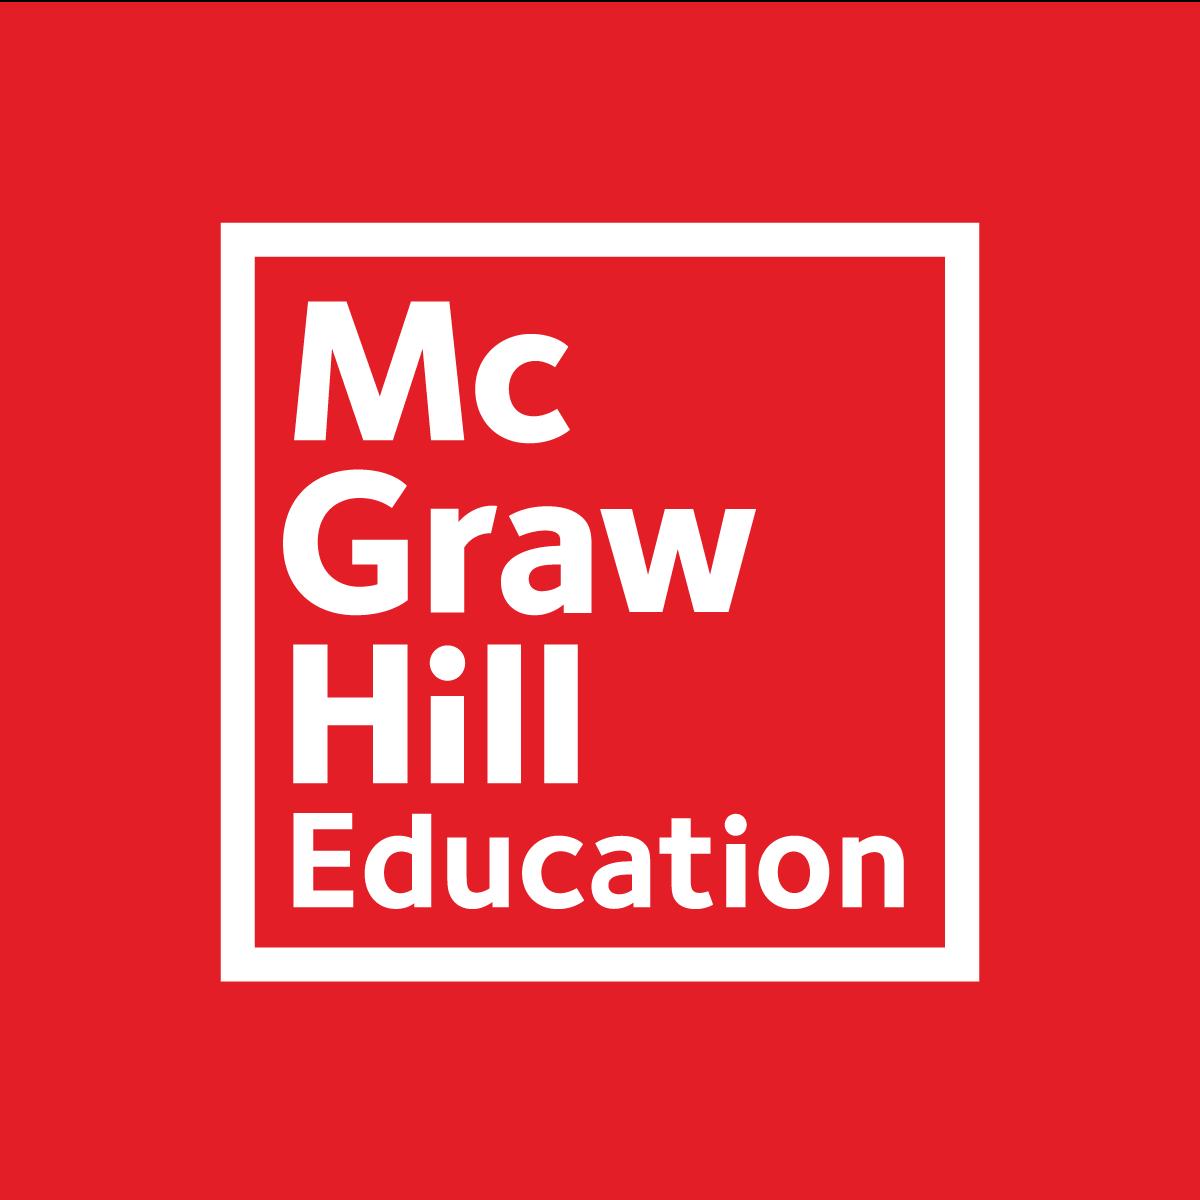 McGraw Hill Honduras